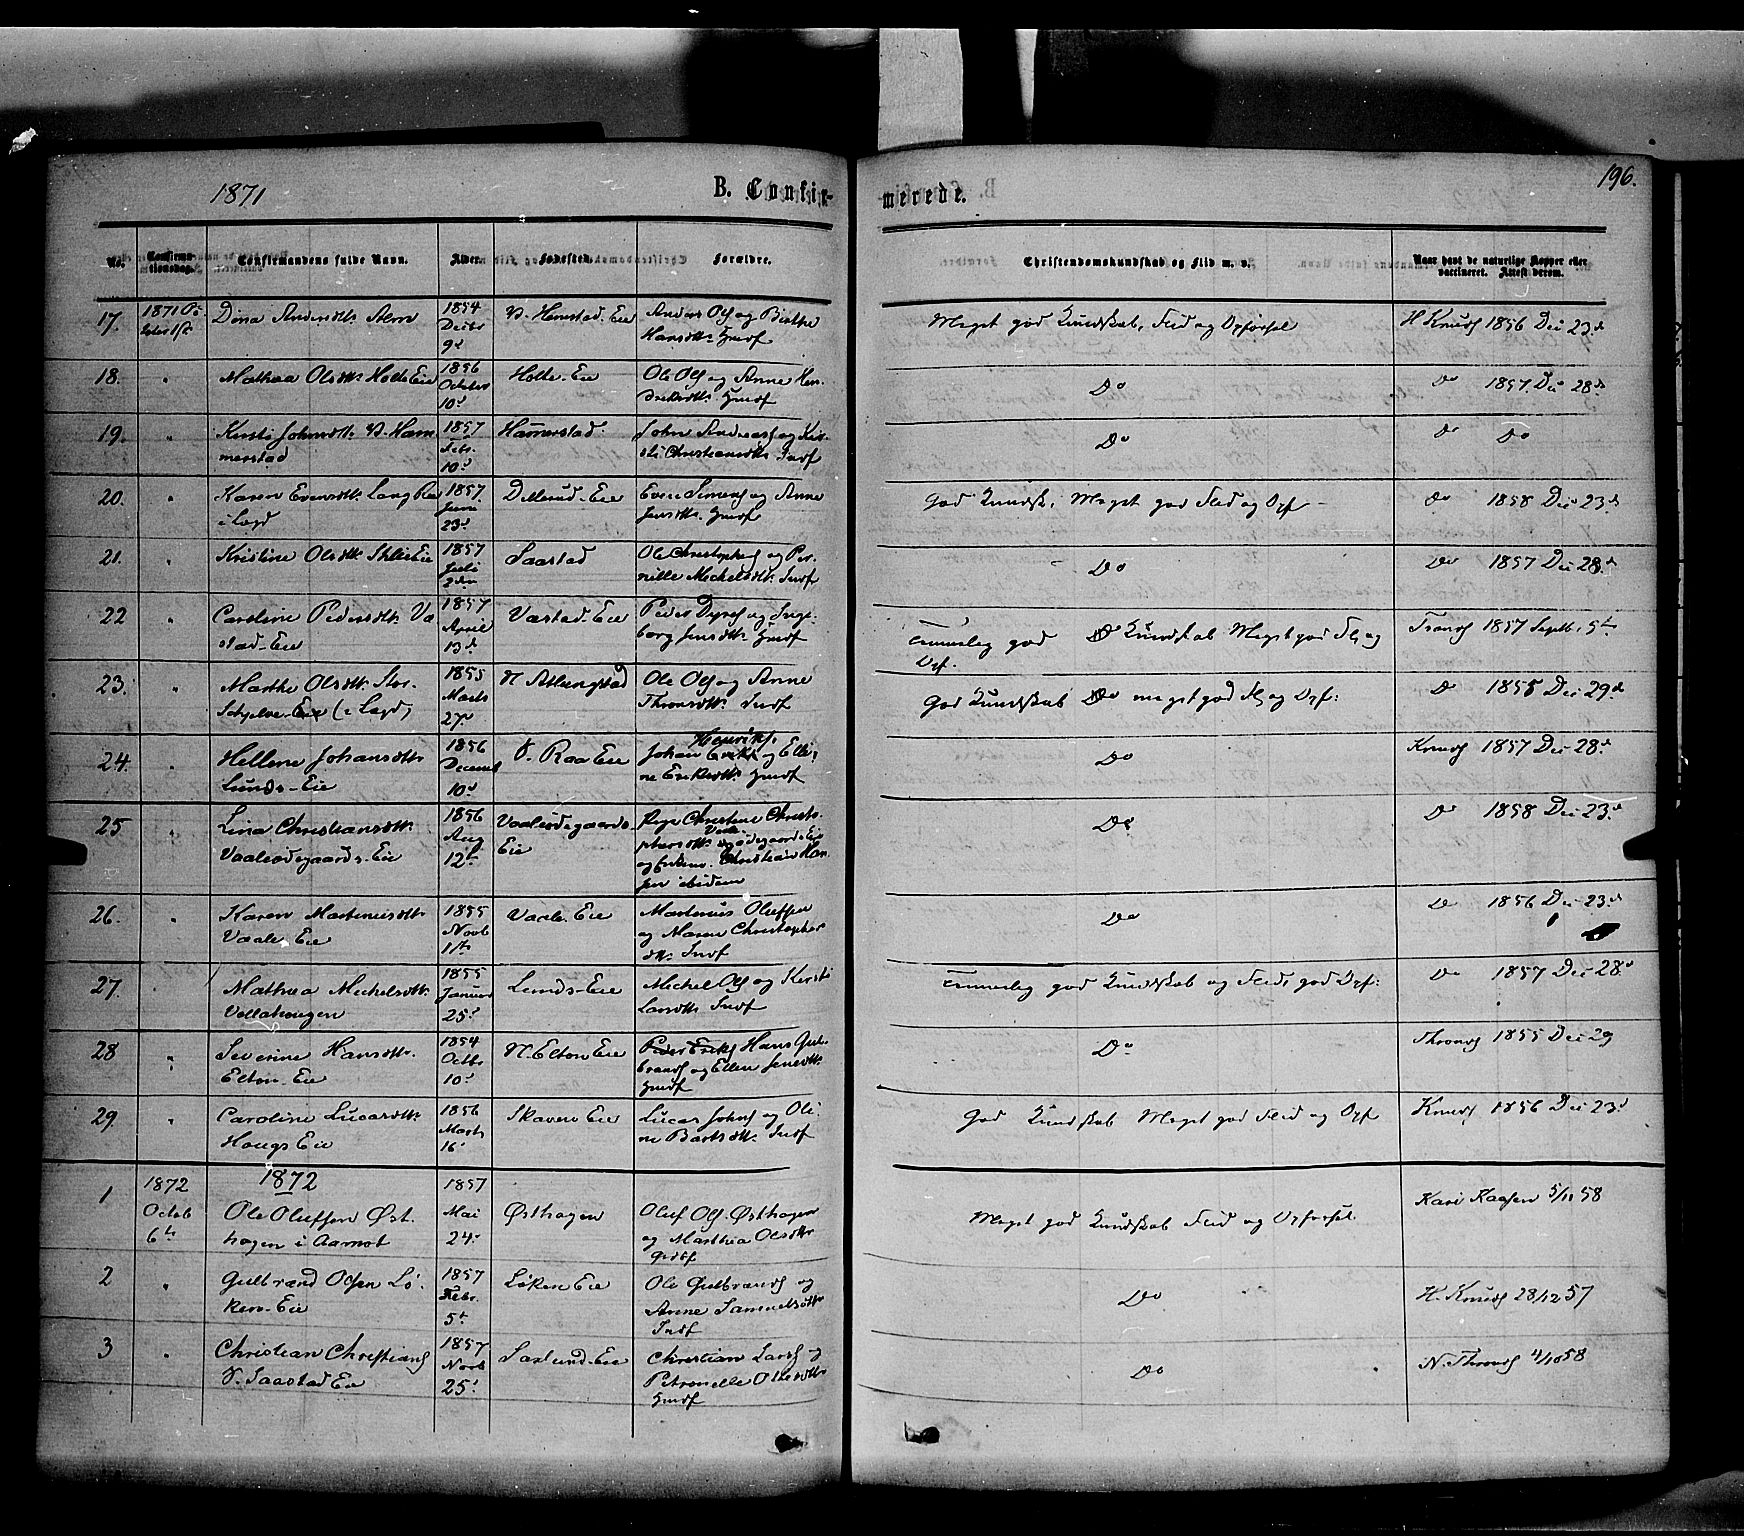 SAH, Stange prestekontor, K/L0013: Ministerialbok nr. 13, 1862-1879, s. 196